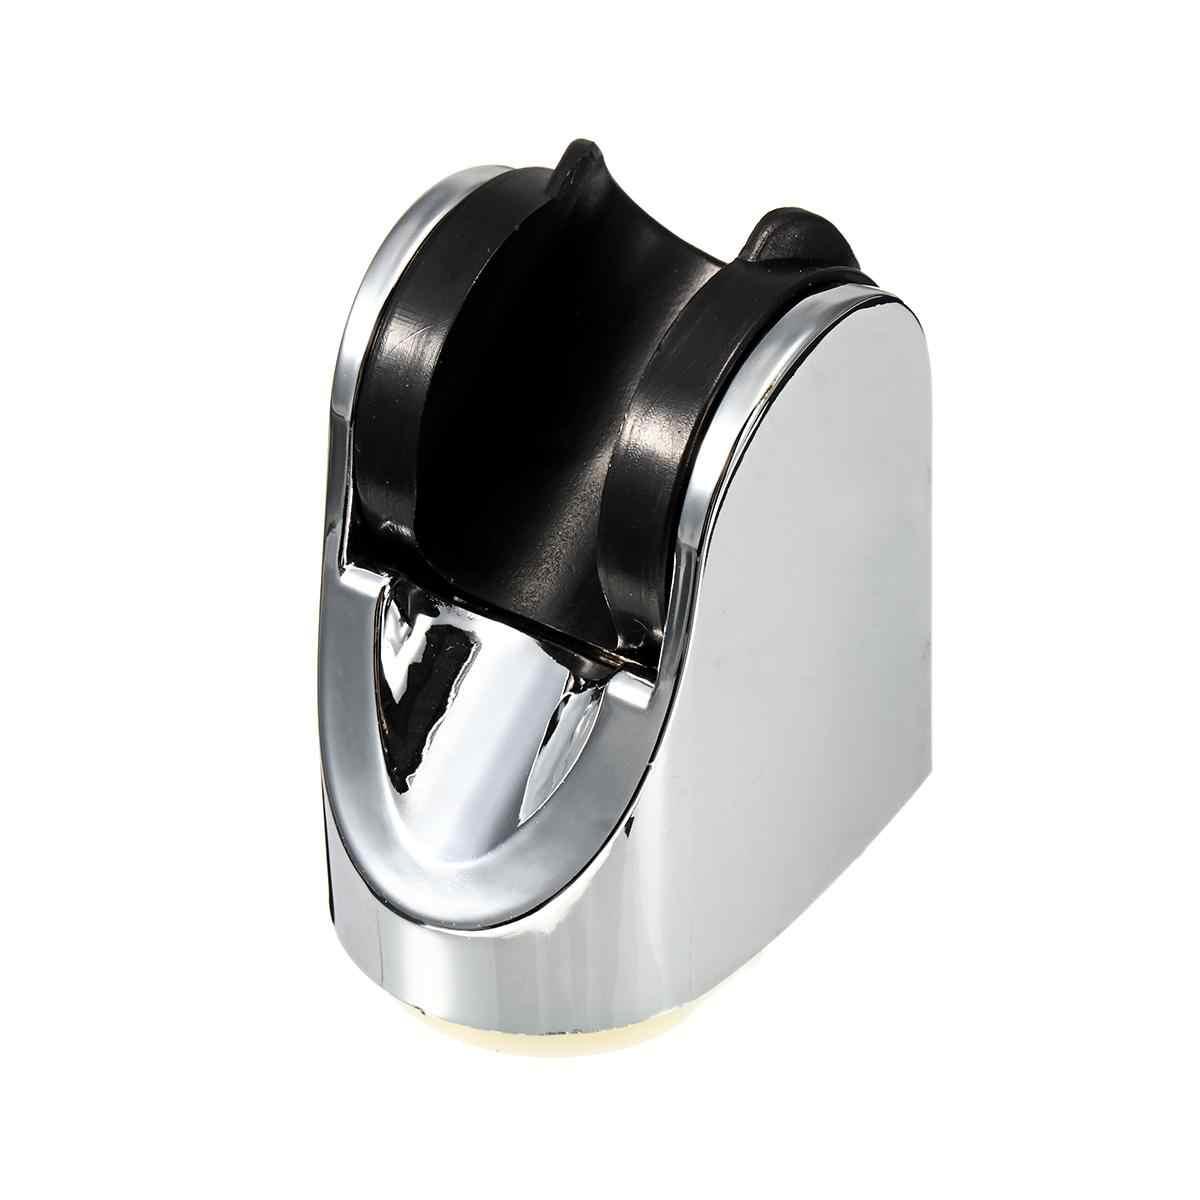 3 Pcs Hand Held Shower Head Jet Douche Bidet Sprayer Toilet Spray Diverter Set Wall Mounted Toilet Flushing Device Suit